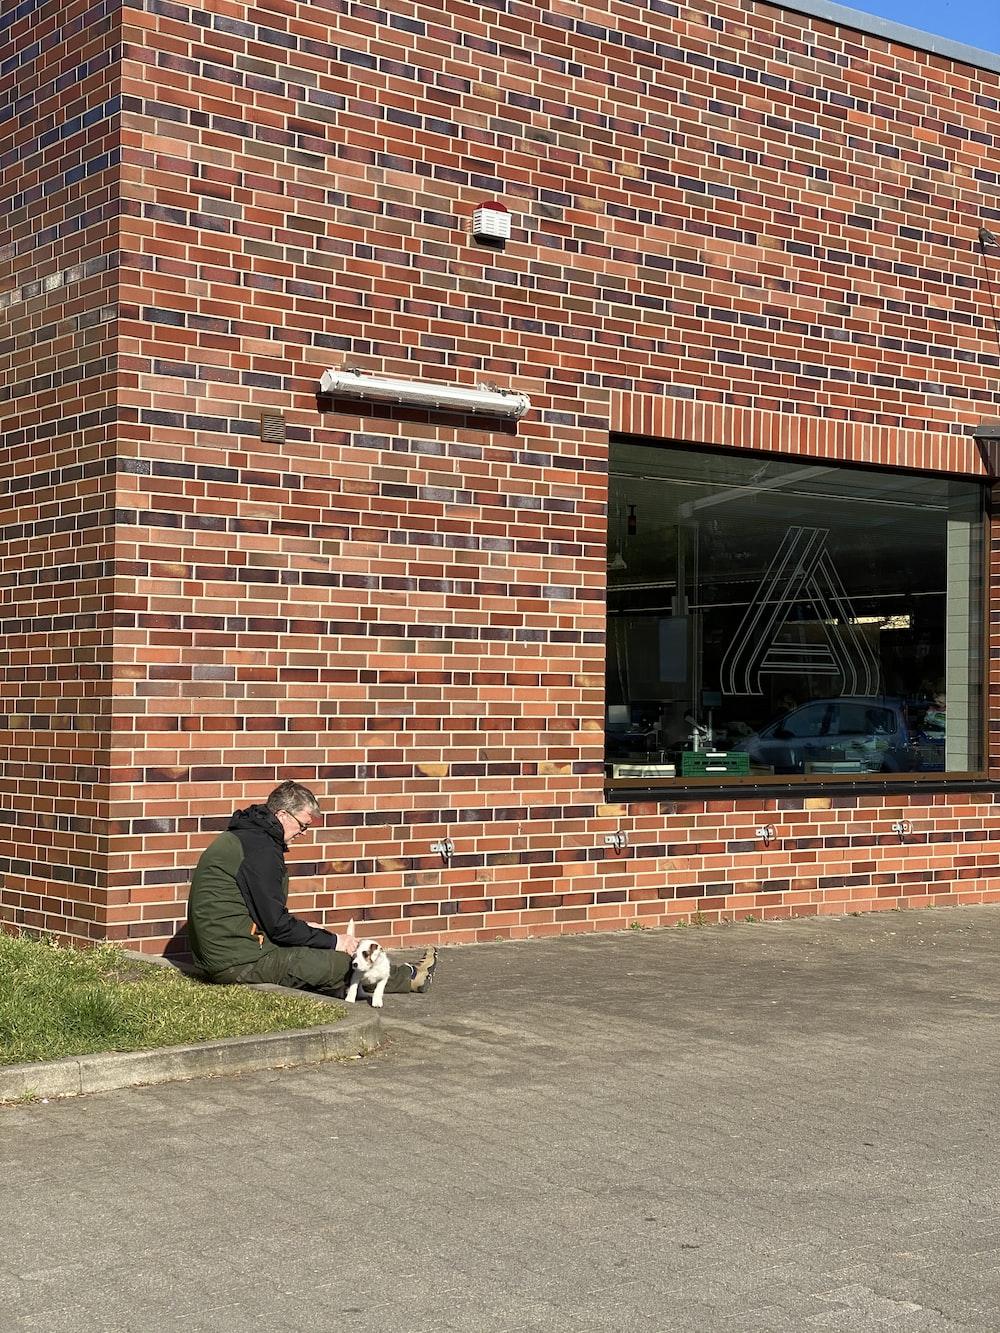 man in black jacket and white pants sitting on sidewalk during daytime